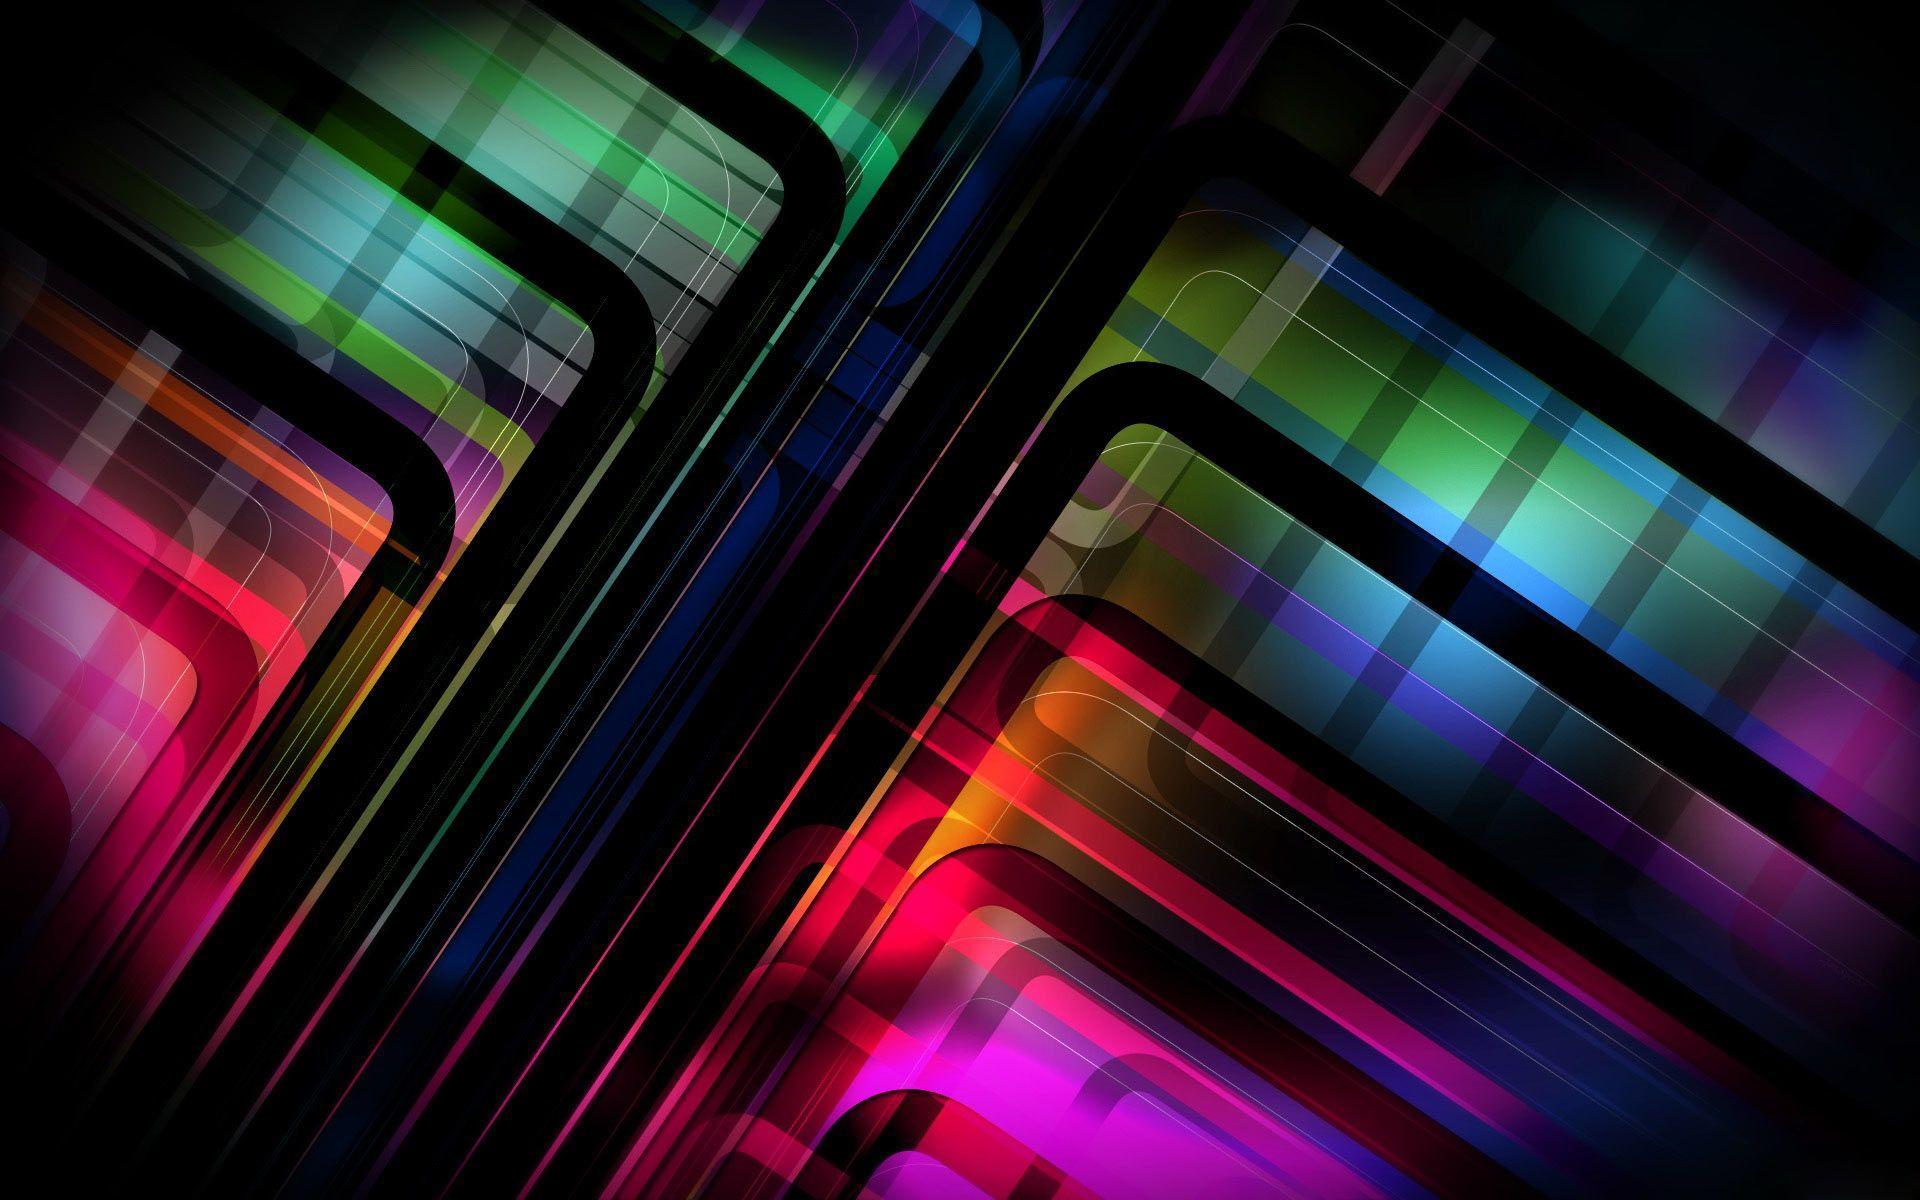 Backgrounds Computer - Wallpaper Cave